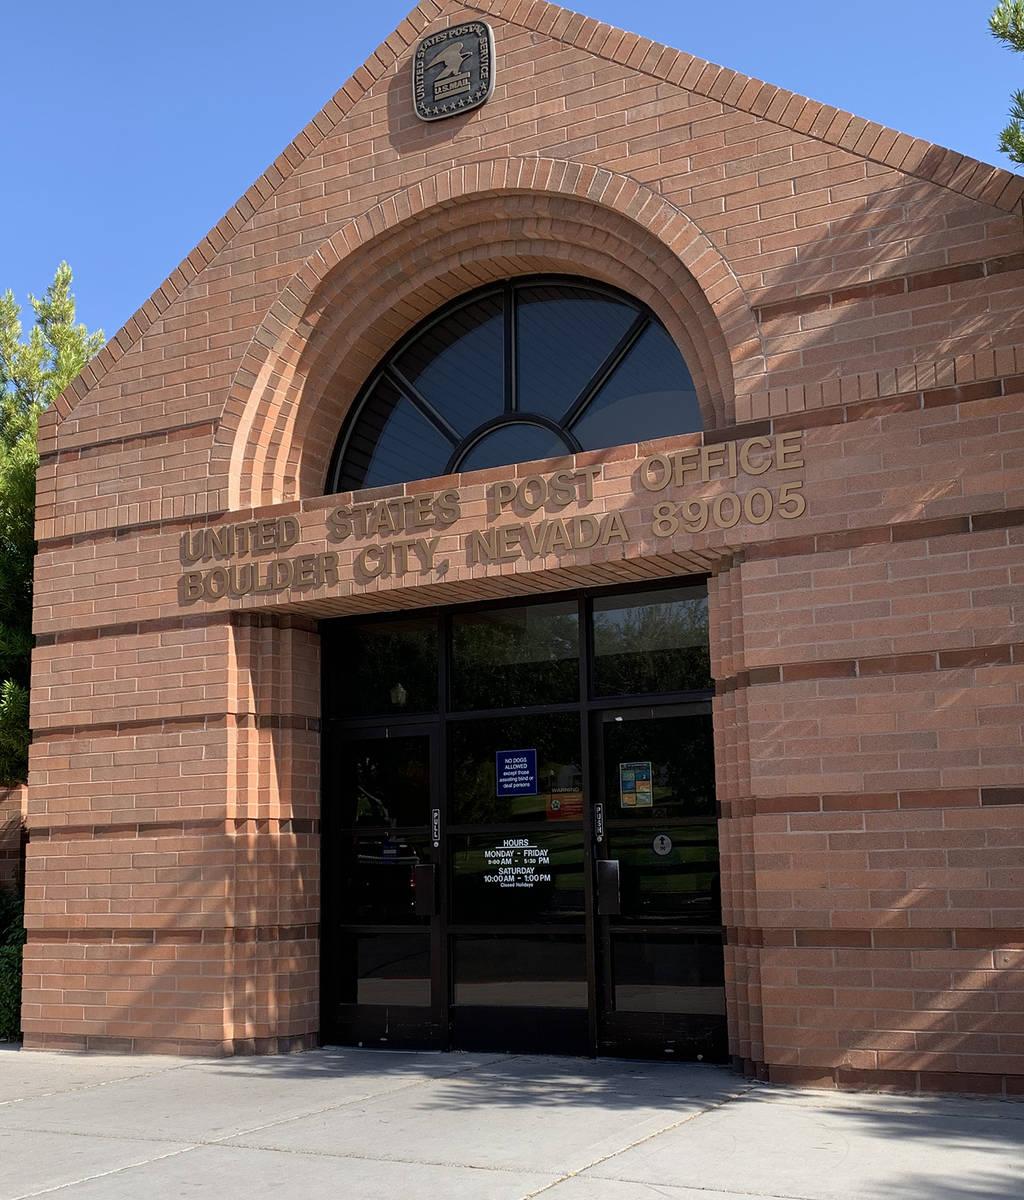 (Hali Bernstein Saylor/Boulder City Review) United States Postal Service officials have determi ...